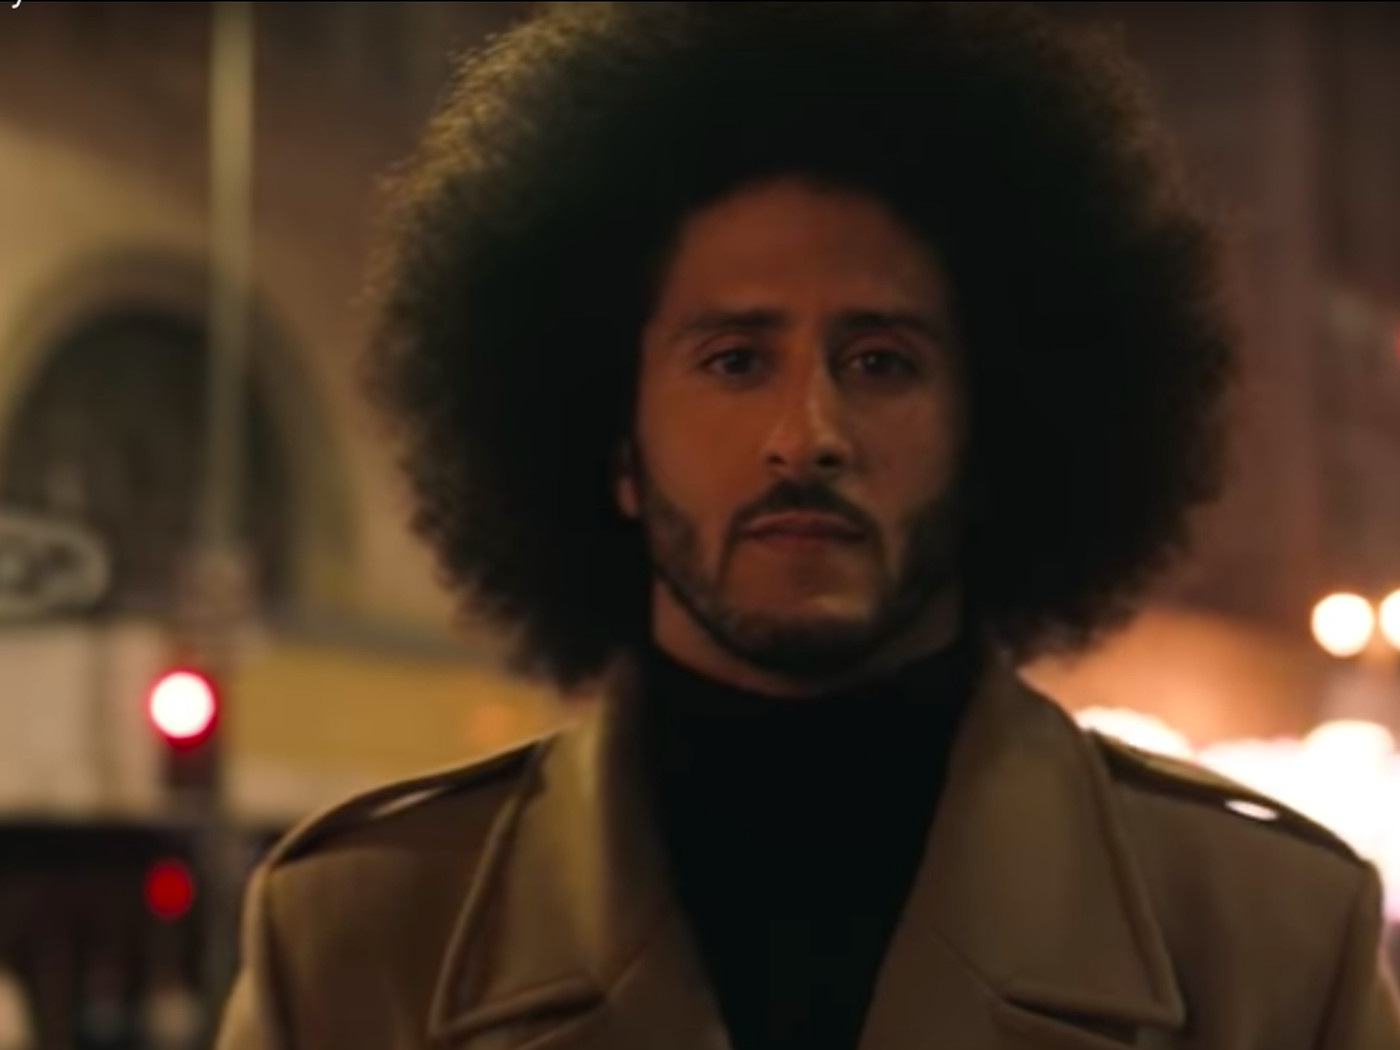 Reciclar tinta Chimenea  Colin Kaepernick's Nike ad raised his profile, but diluted his ...